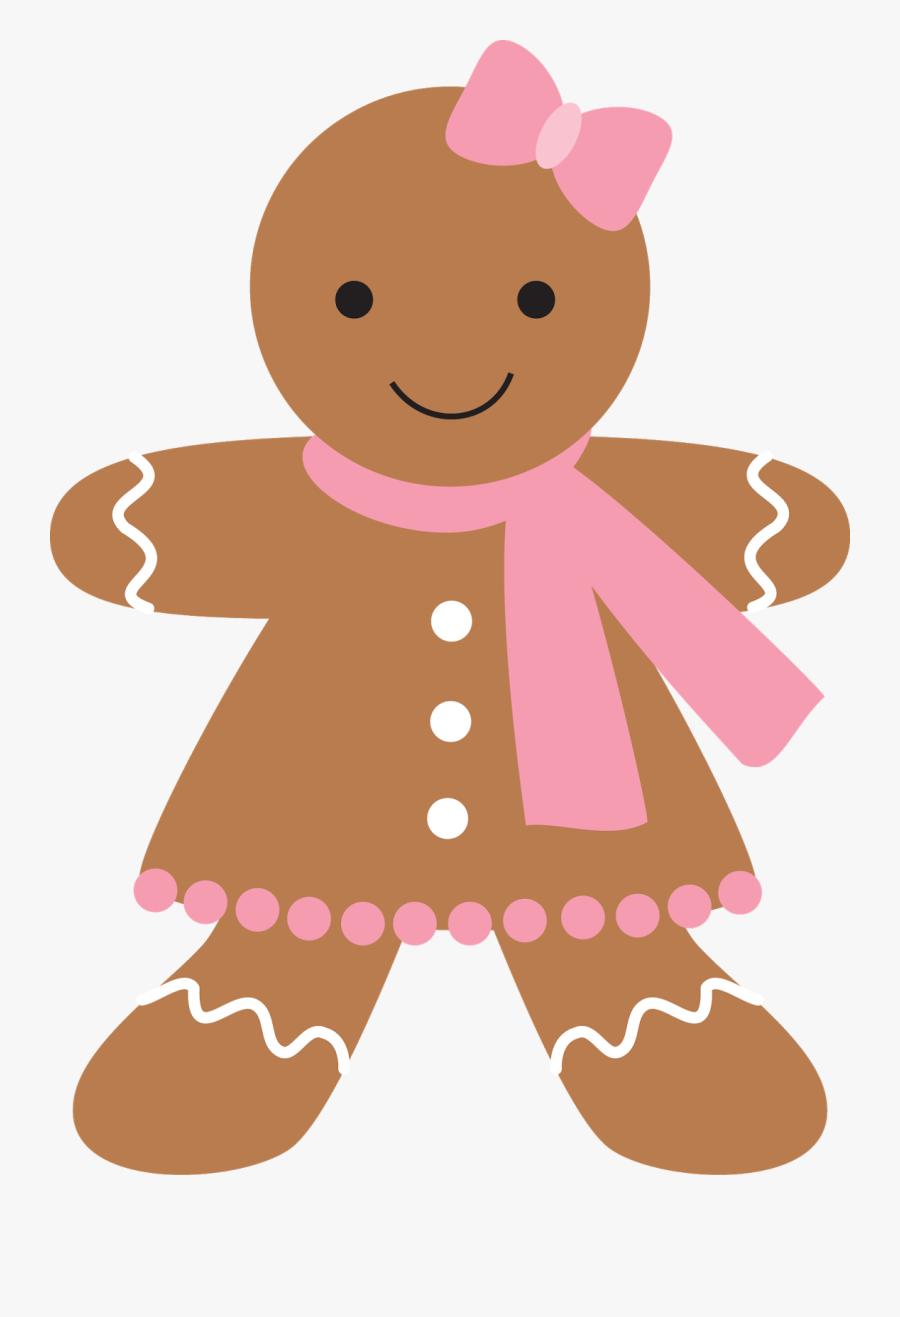 Christmas Clip Art 2 - Pink Gingerbread Girl Clipart, Transparent Clipart